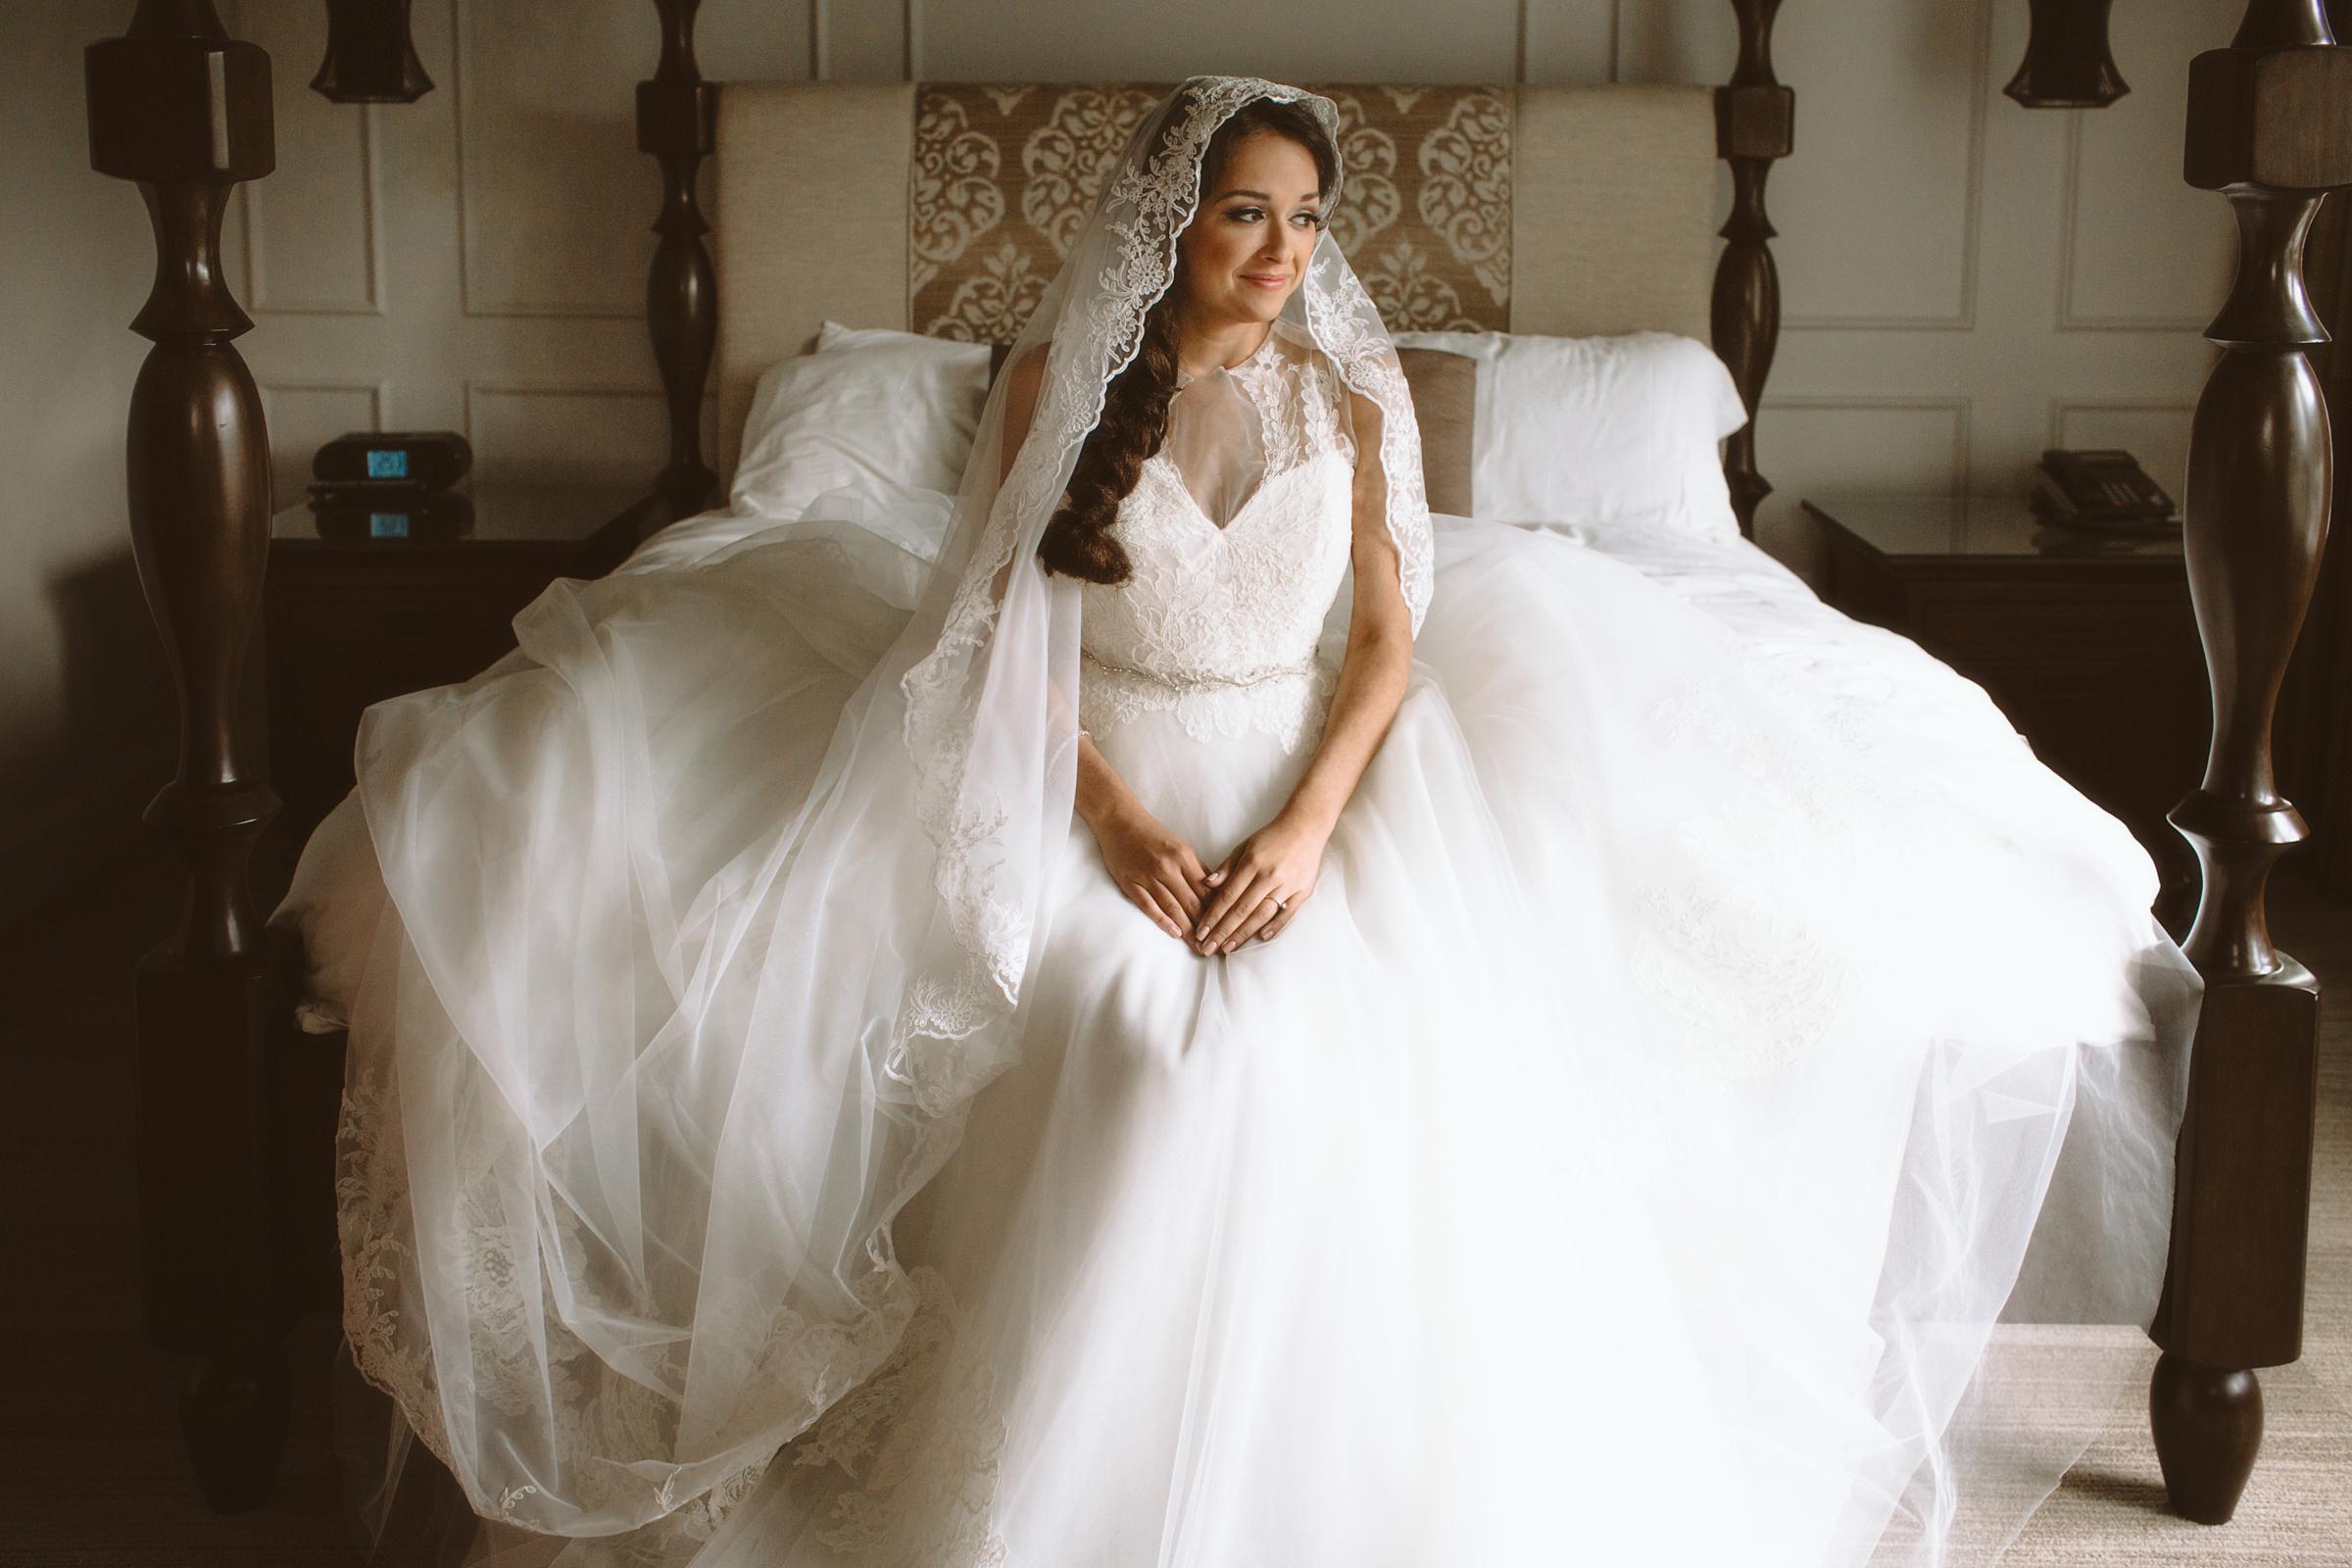 wedding day | MFA St Pete | Vanessa Boy Photography | vanessaboy.com-106.com |final.jpg